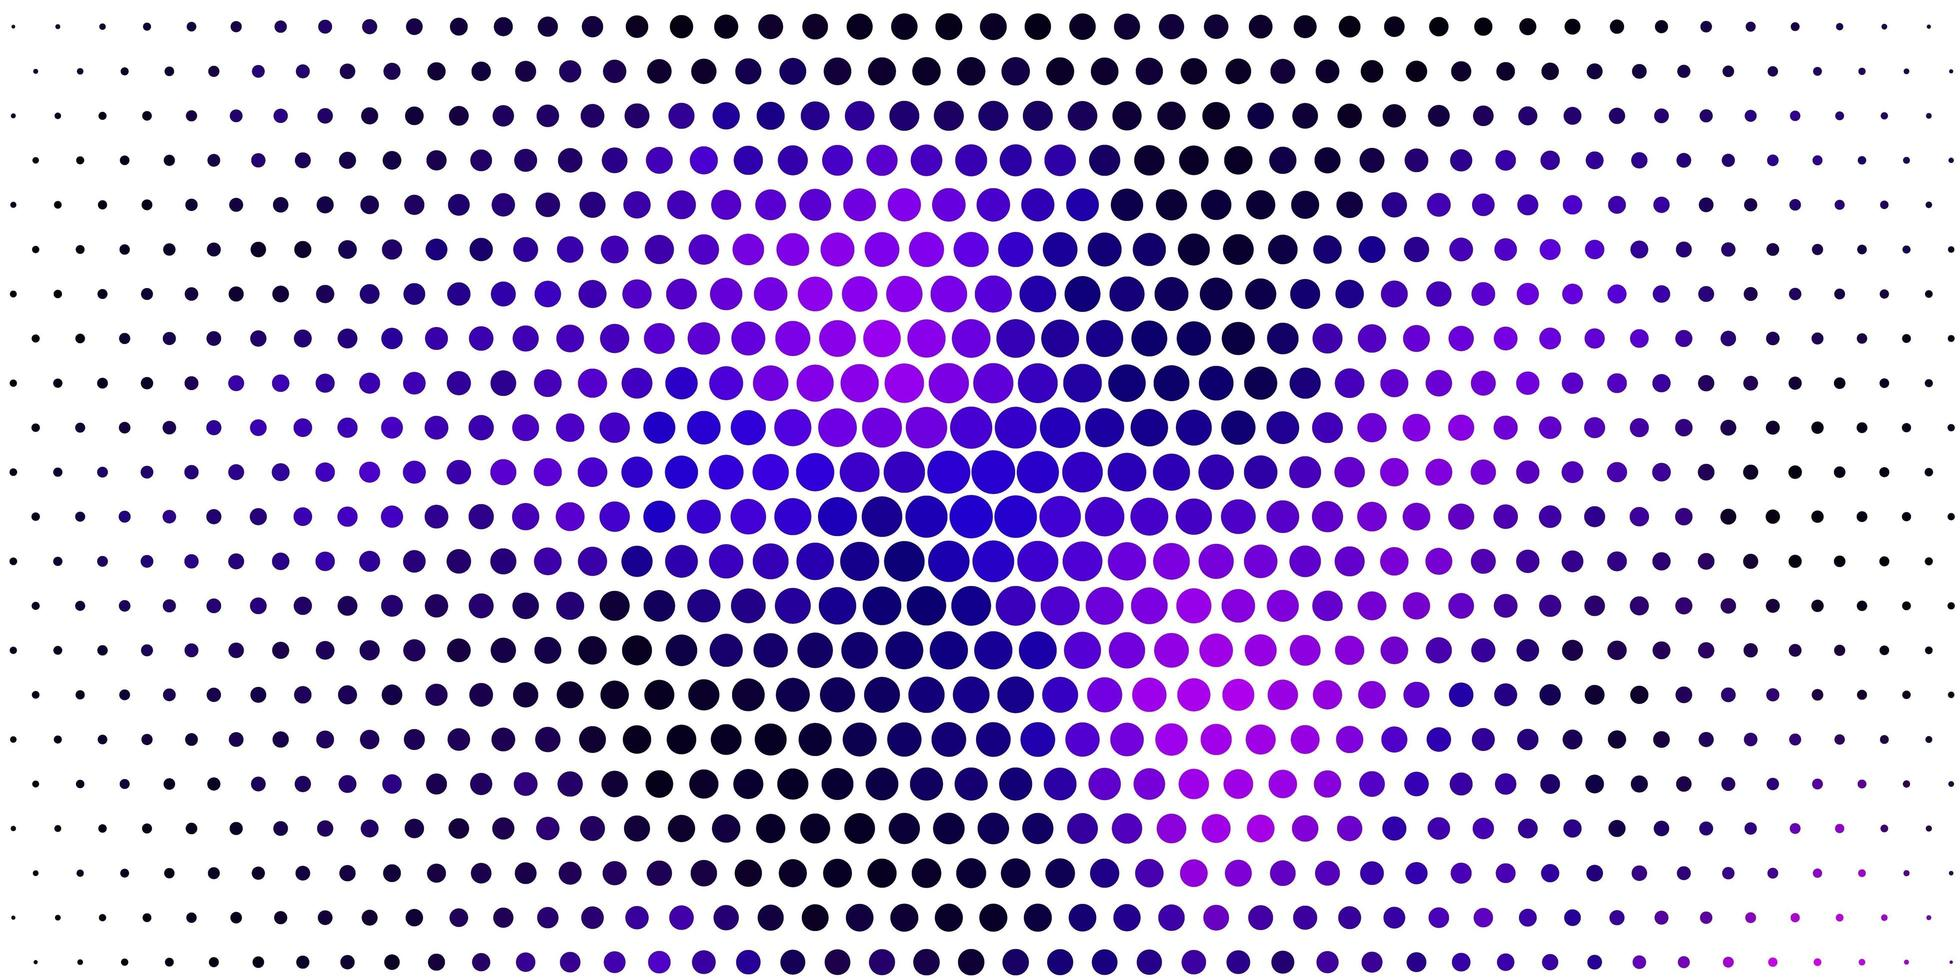 hellviolette, rosa Vektorschablone mit Kreisen. vektor